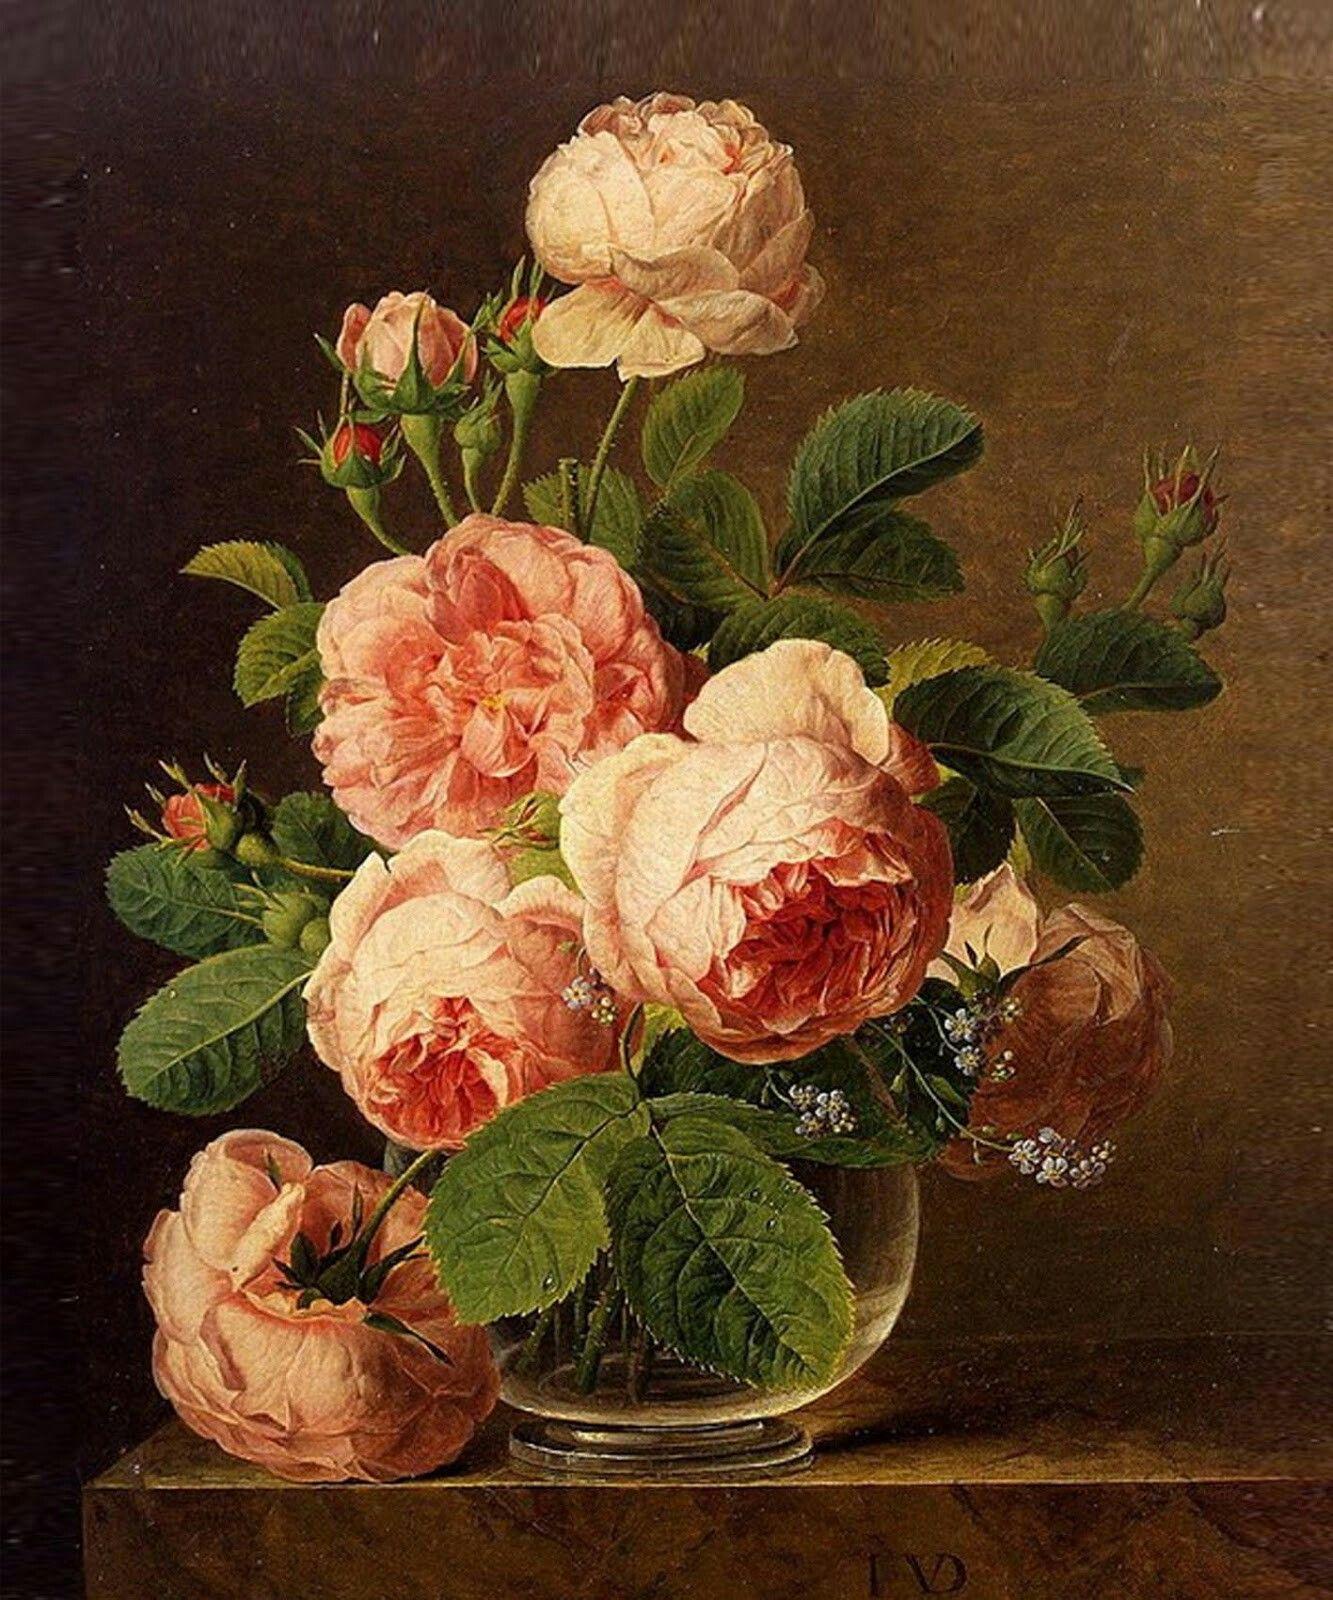 Розы в стеклянной вазе :: Ян Франц ван Дил - Натюрморт, цветы ( new ) фото